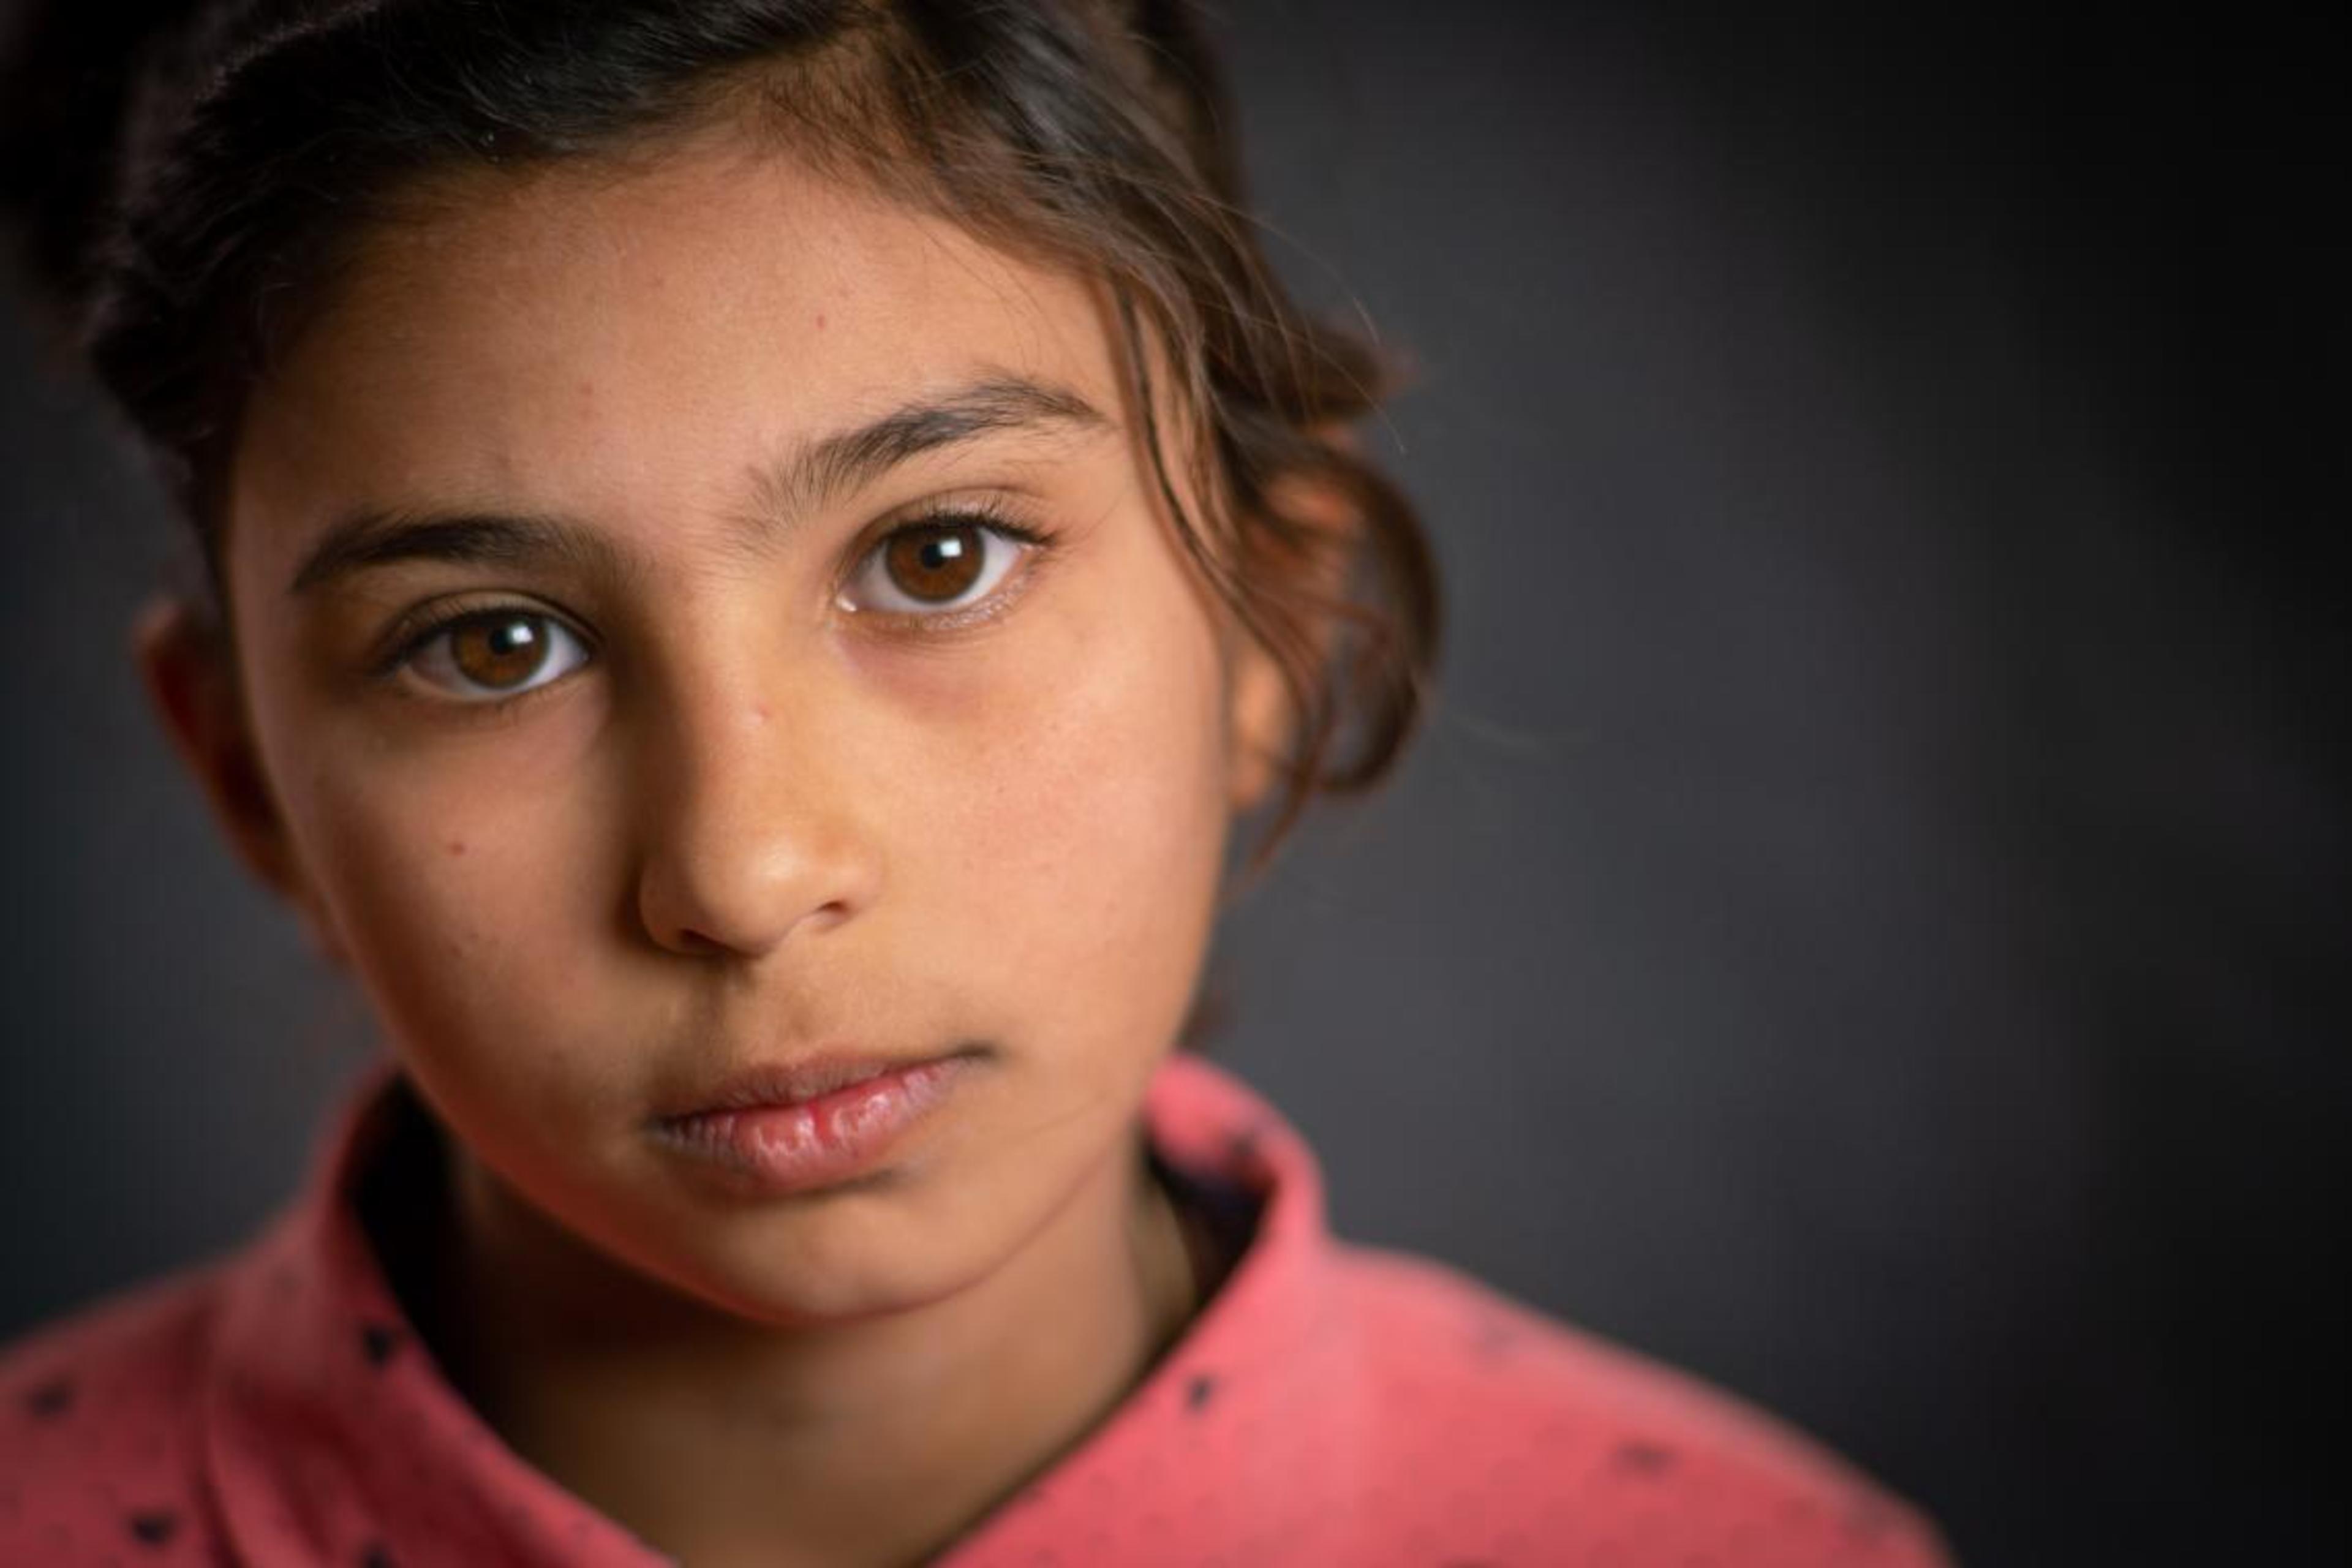 UNICEF/UN0264938/Herwig